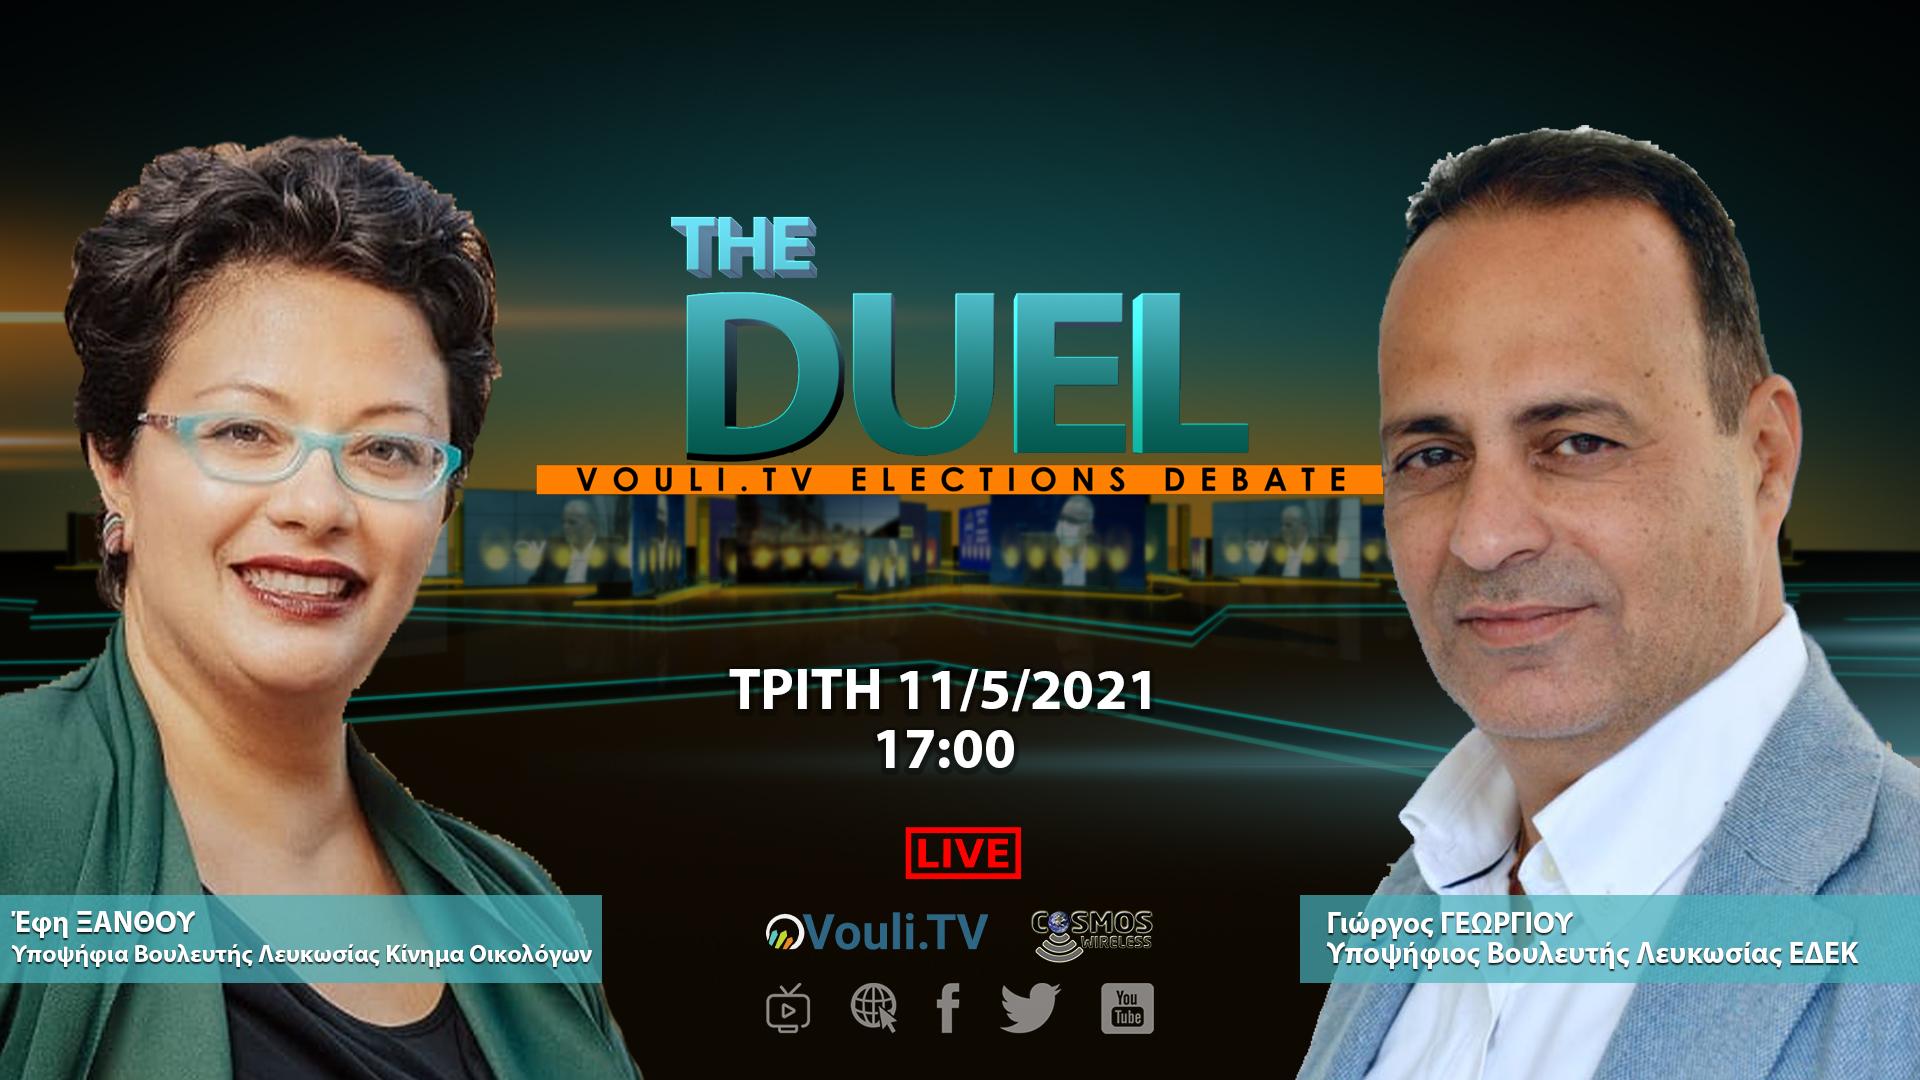 'The Duel' «Διαφθορά και διαπλοκή - Υπάρχει ελπίδα;», με Γεωργίου (ΕΔΕΚ) και Ξάνθου (Οικολόγοι) | 11/05/2021